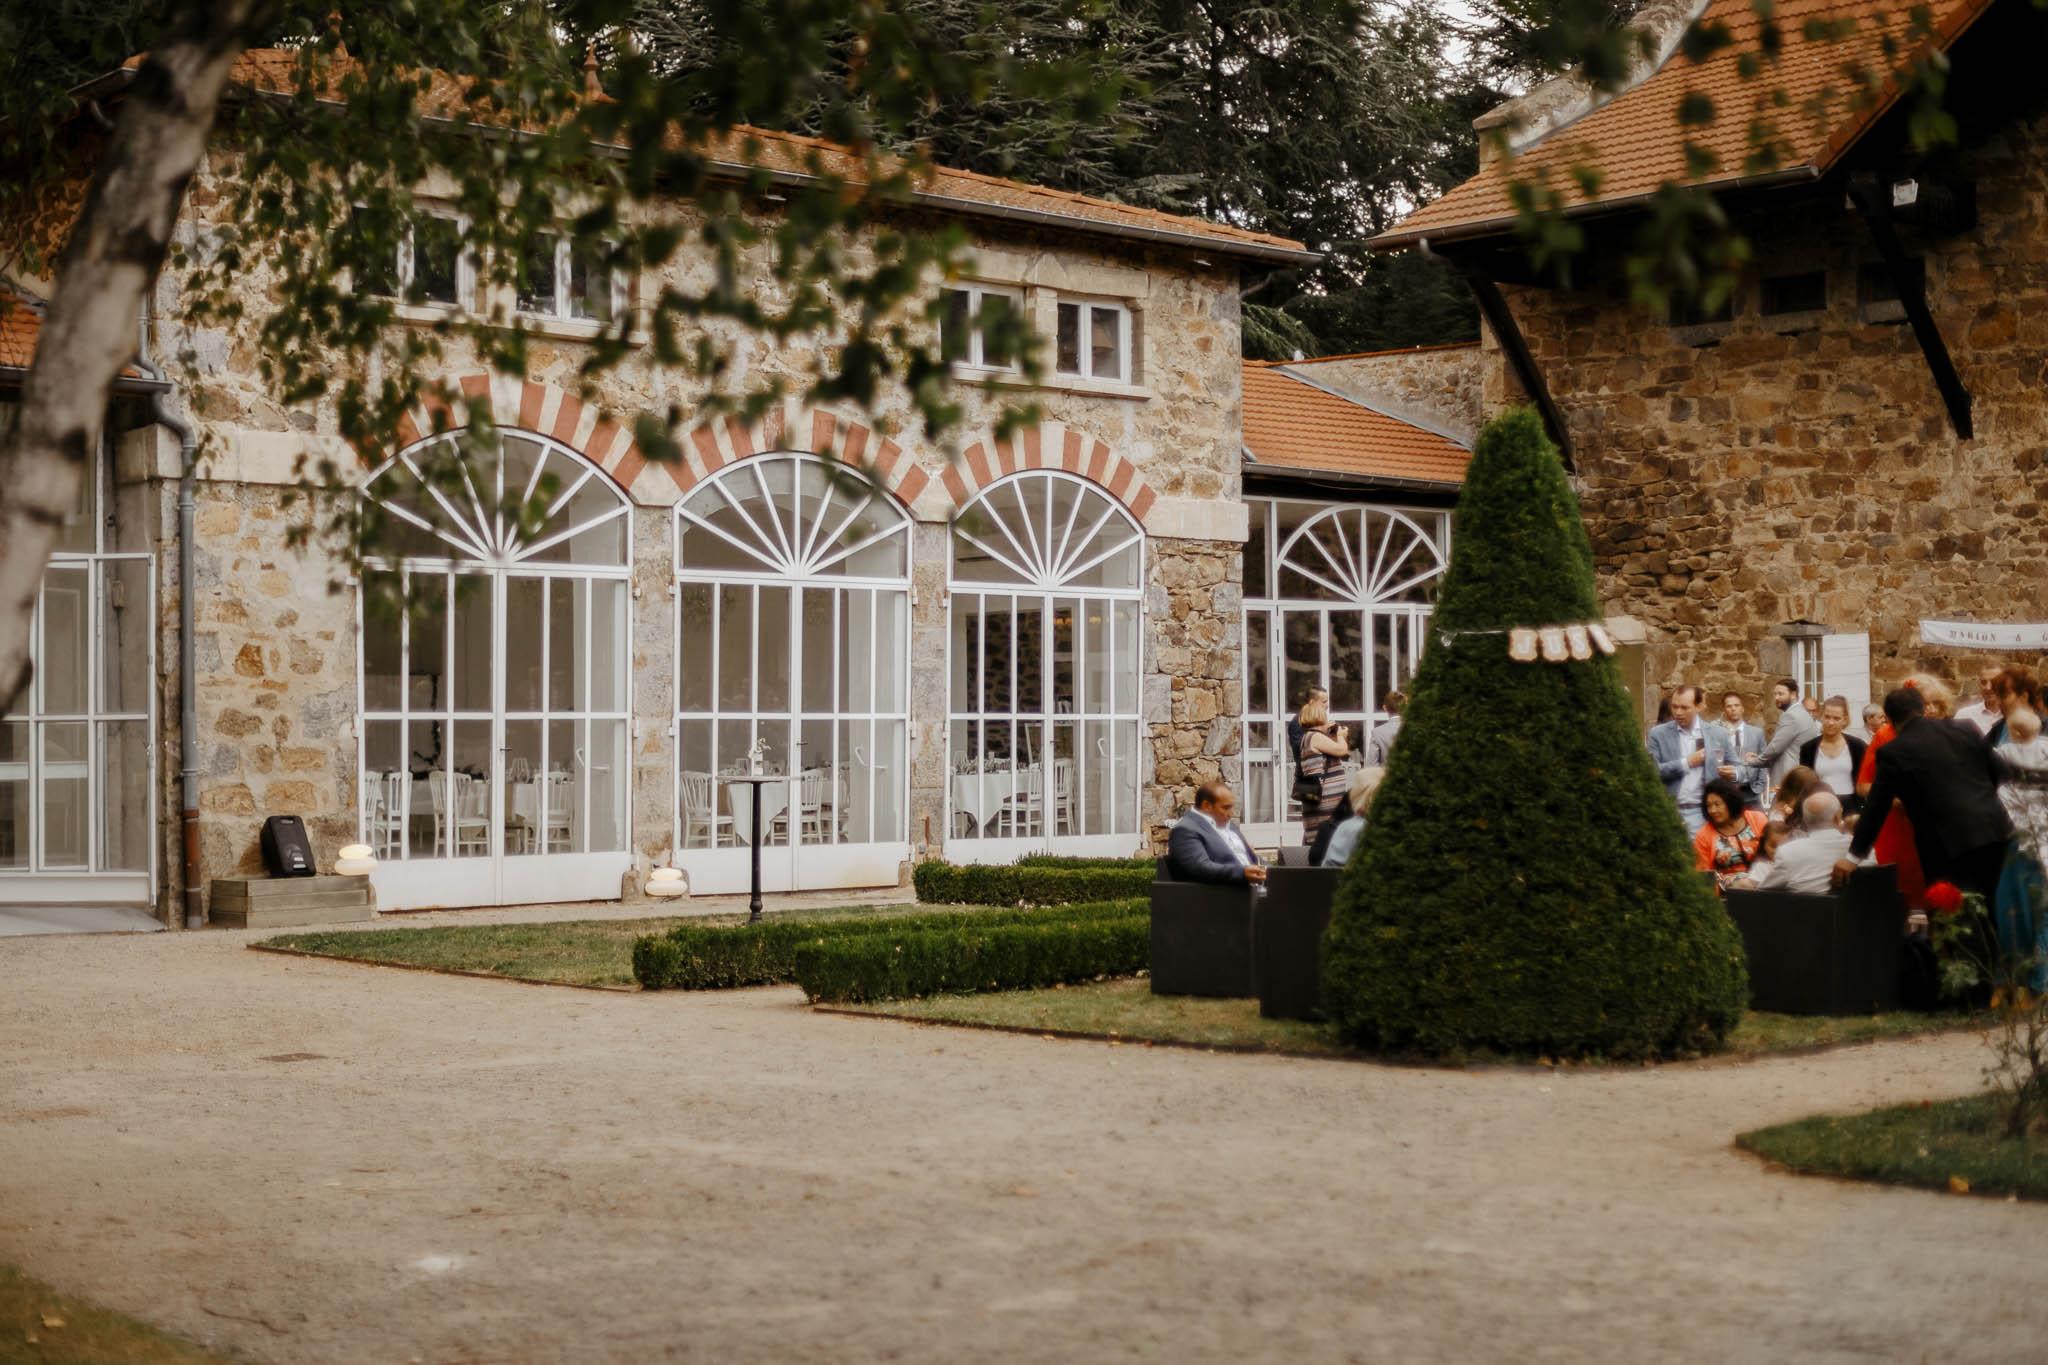 mariage-chateau-gaudras-ingold-73.jpg